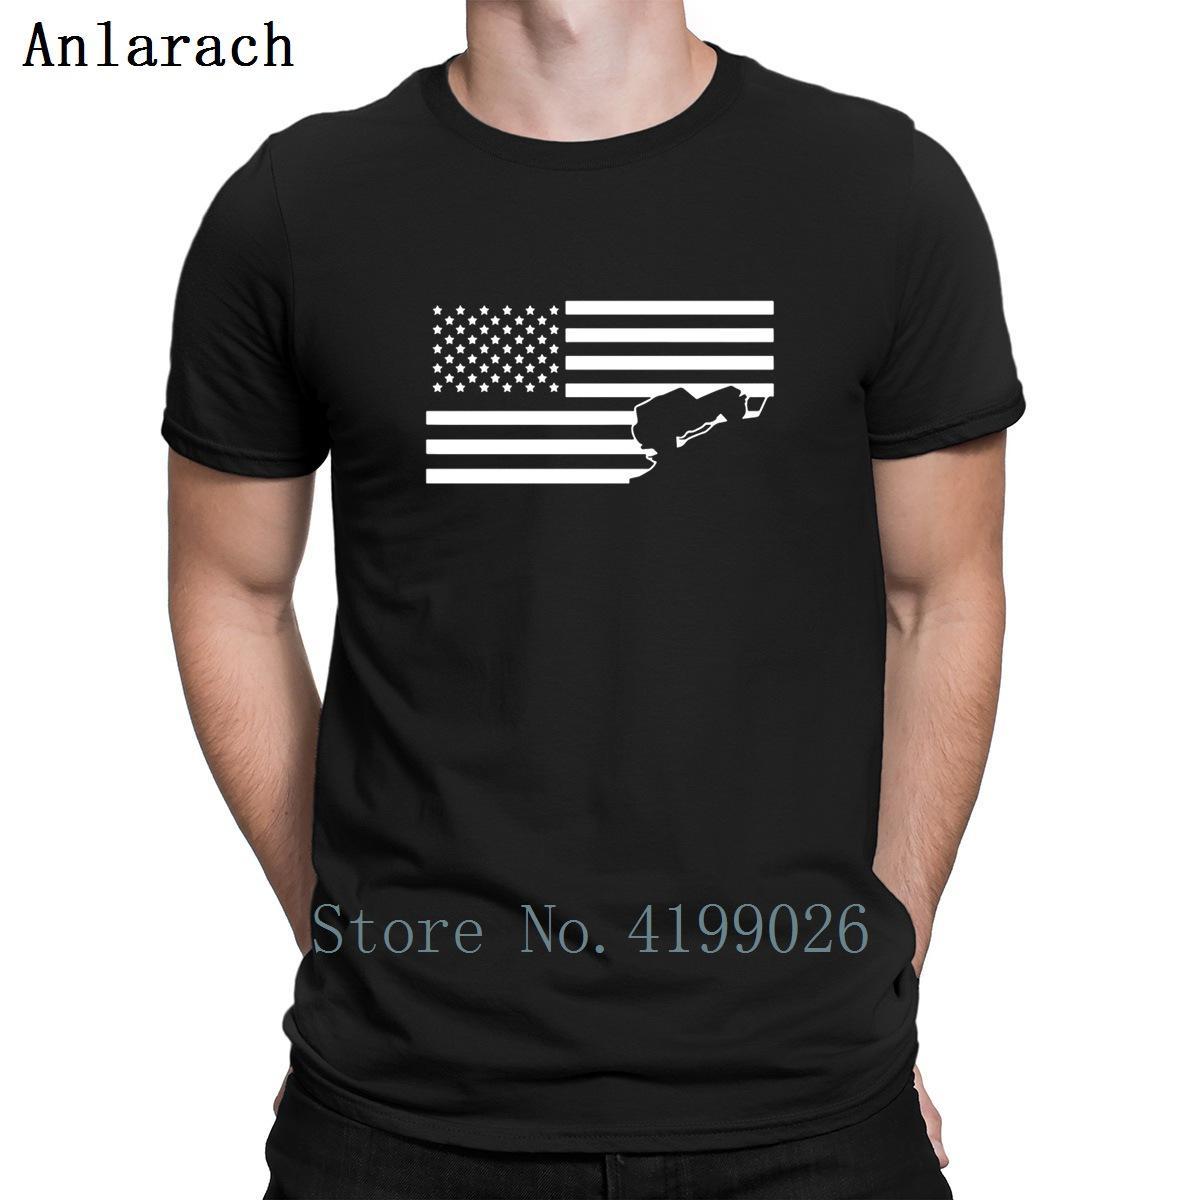 América jipes Camisetas Primavera Funky do Tops Personalizar Casual Anlarach Vintage Clothes Plus Size T Shirt